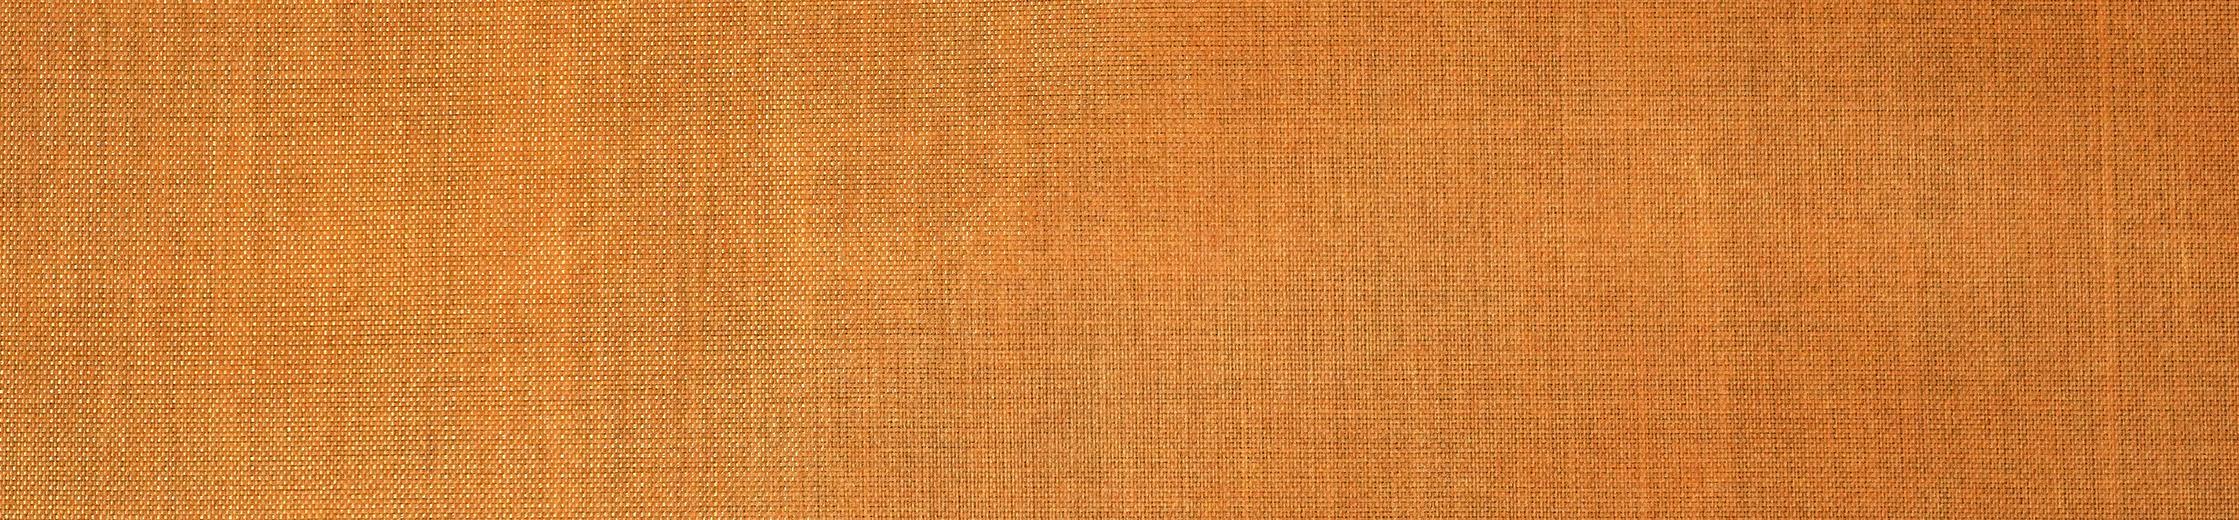 Dyneema® Composite Fabric